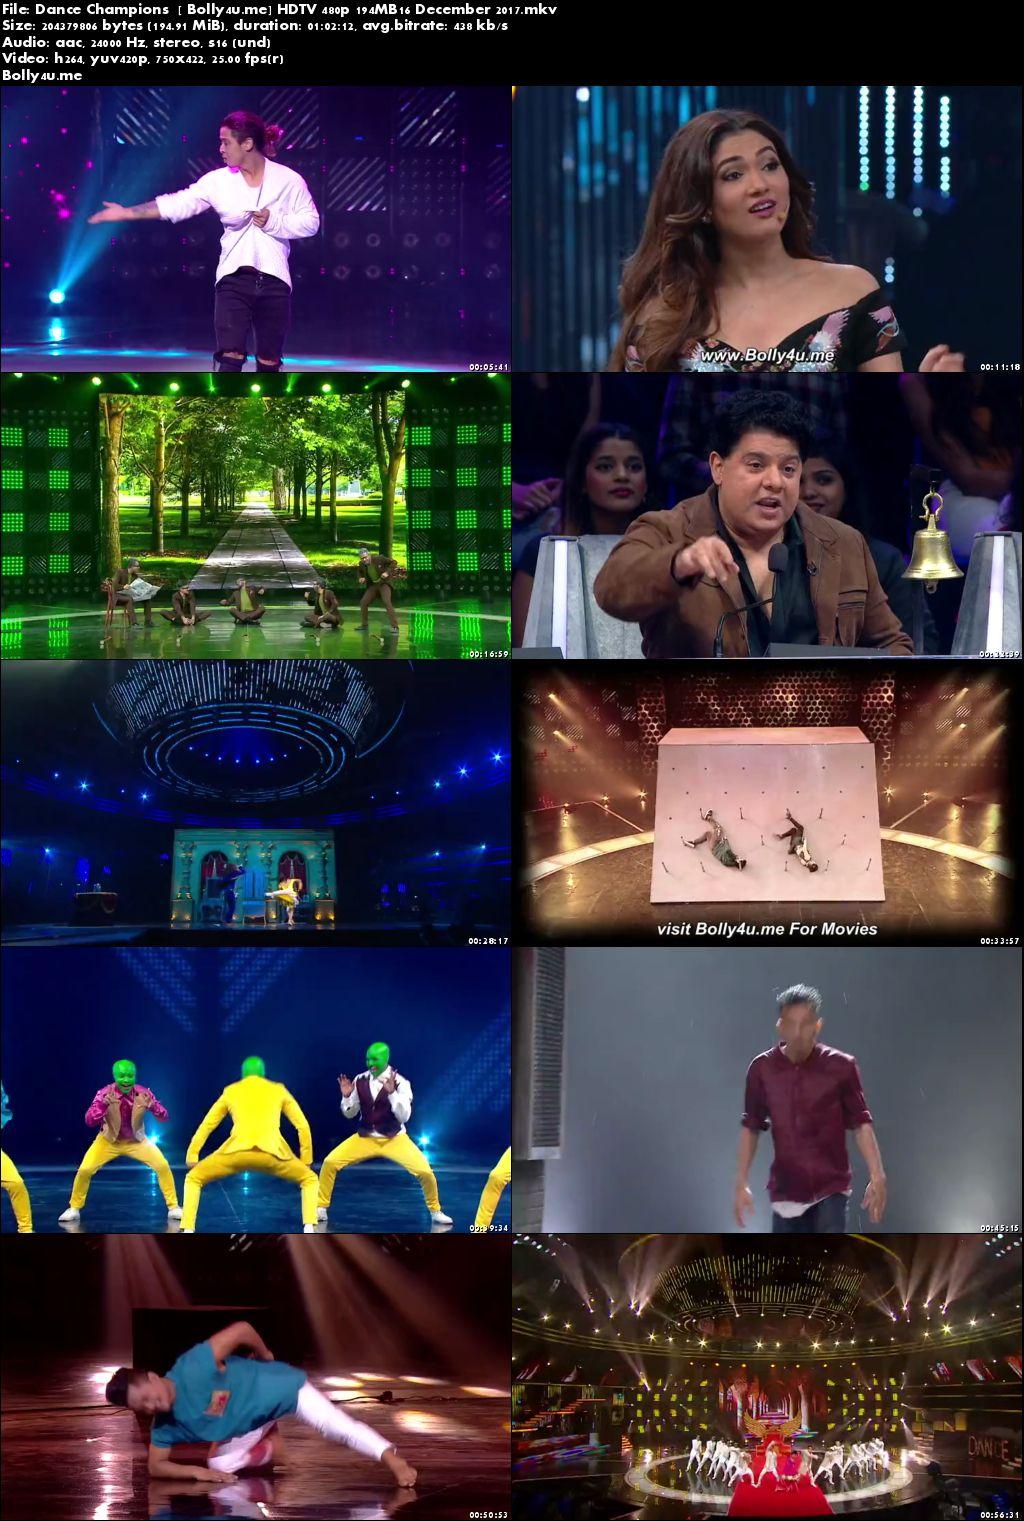 Dance Champions HDTV 480p 200MB 16 Dec 2017 Download